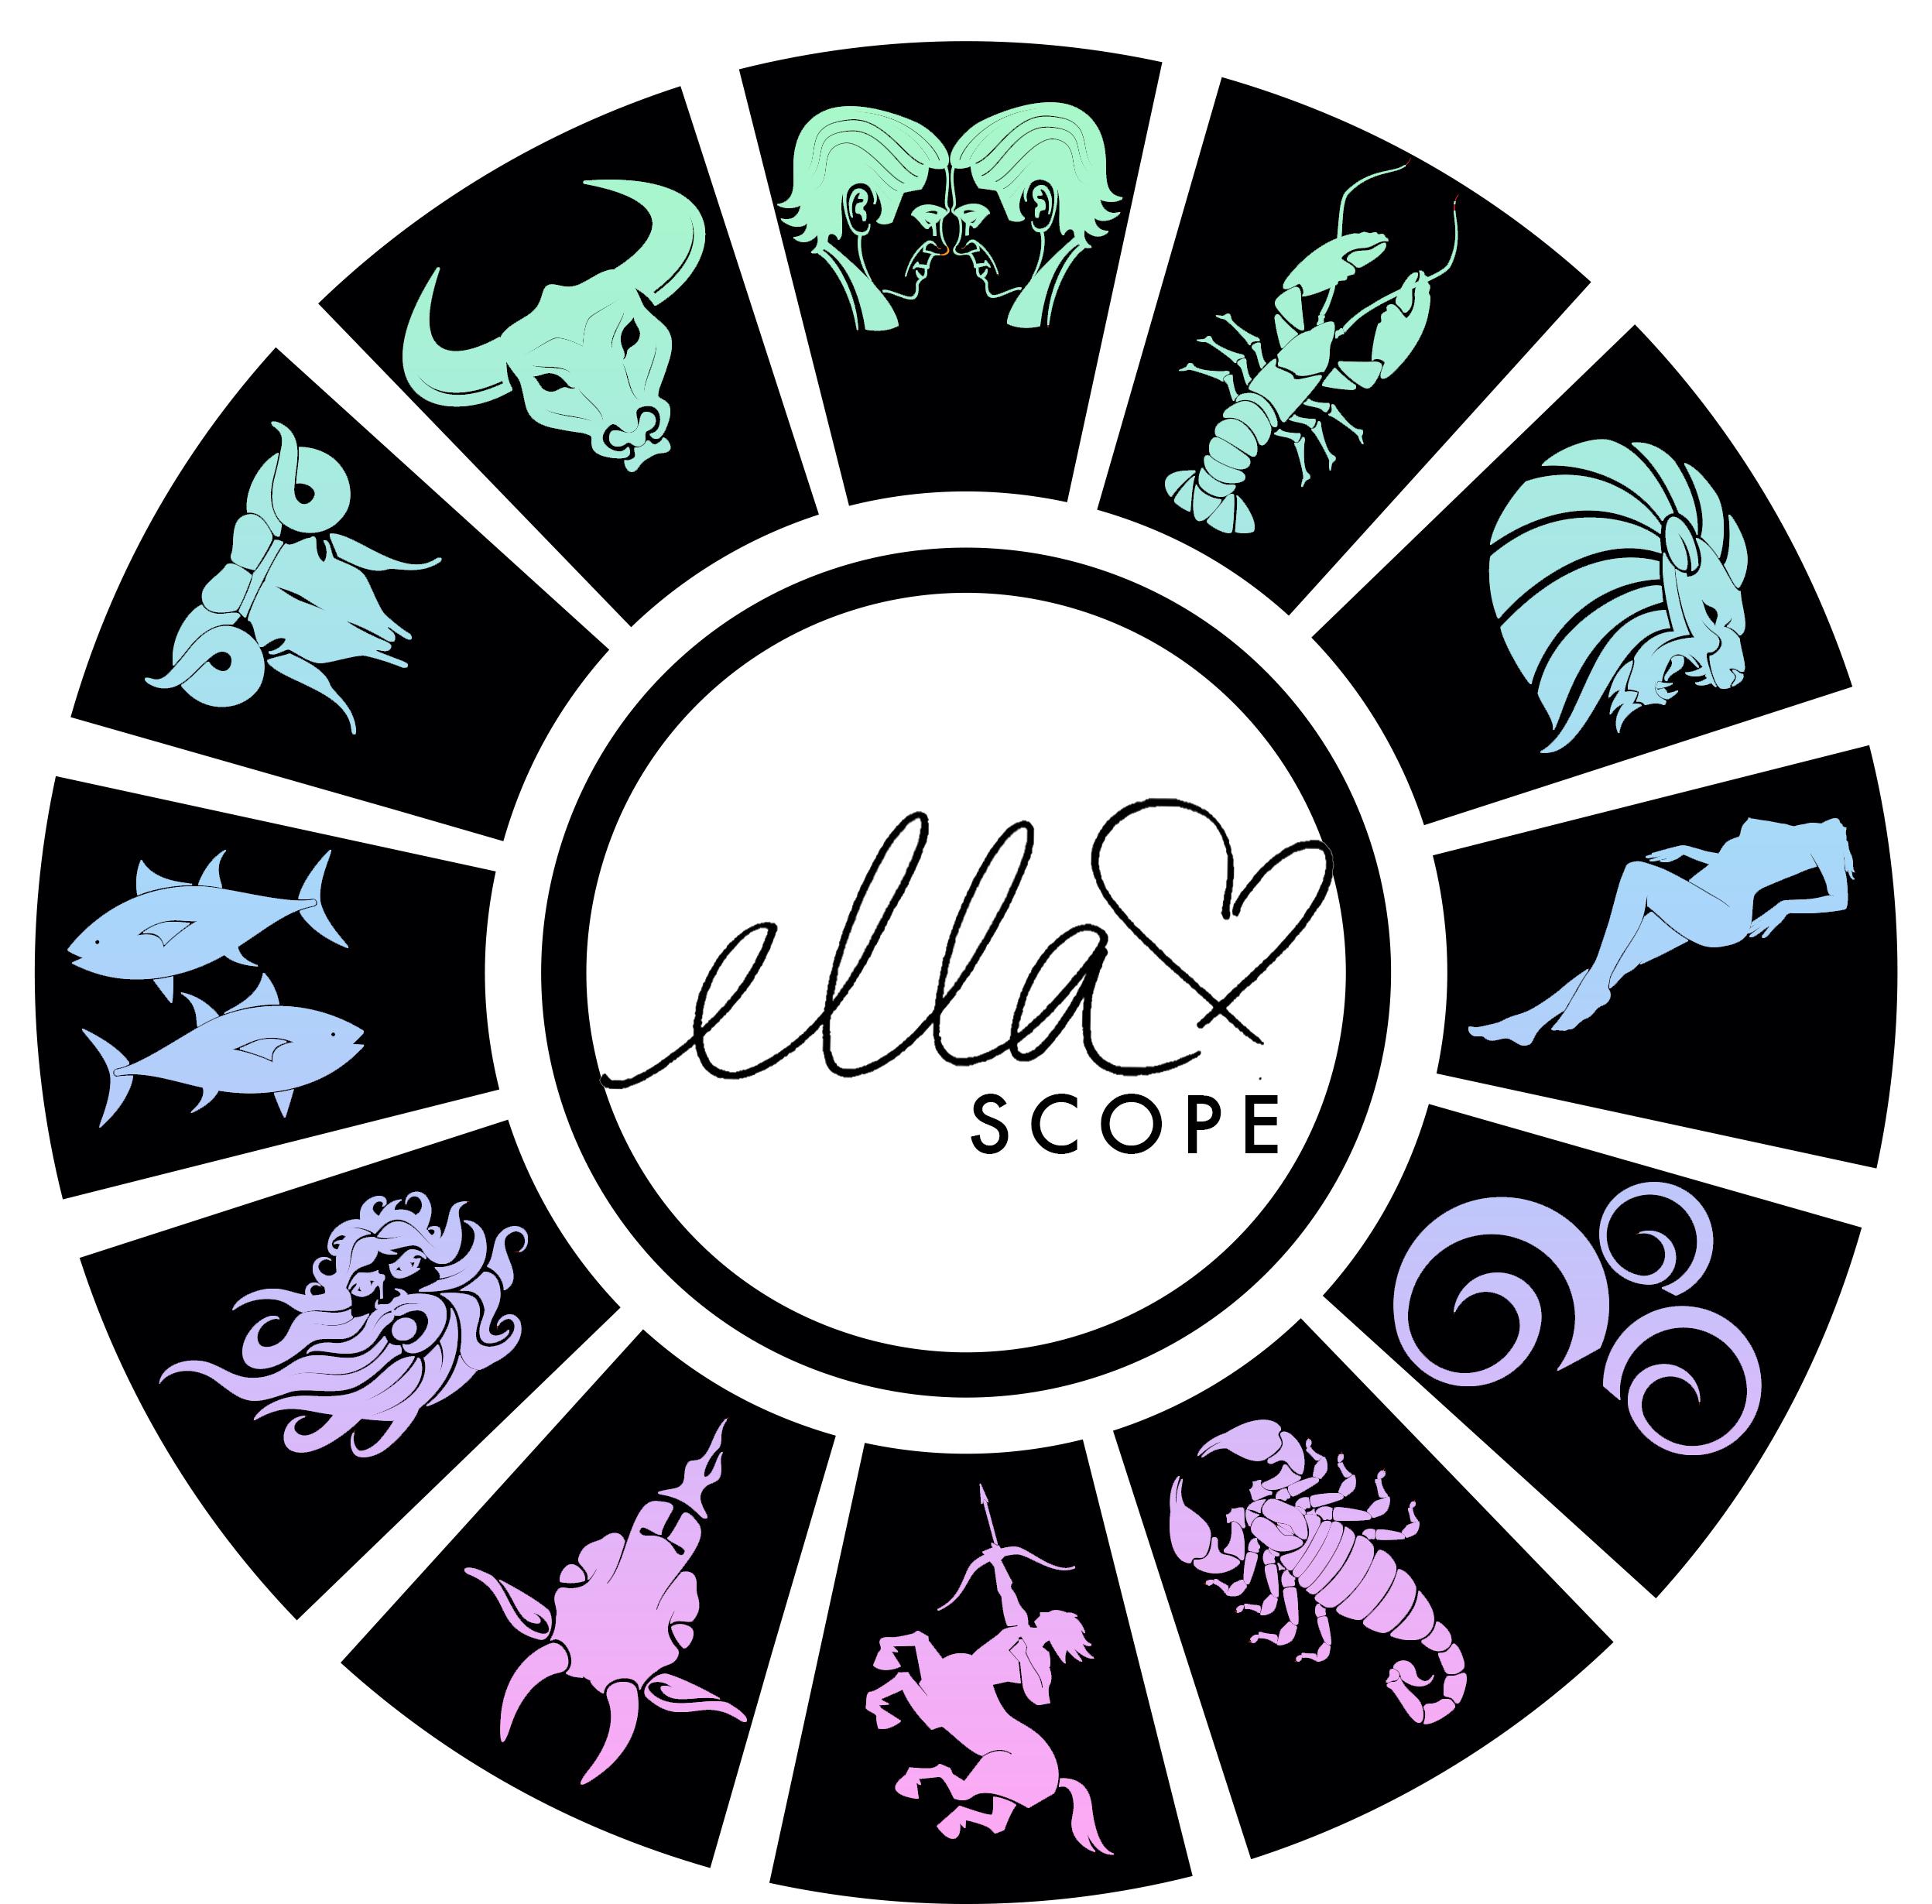 ELLAscope_Wheel.jpg